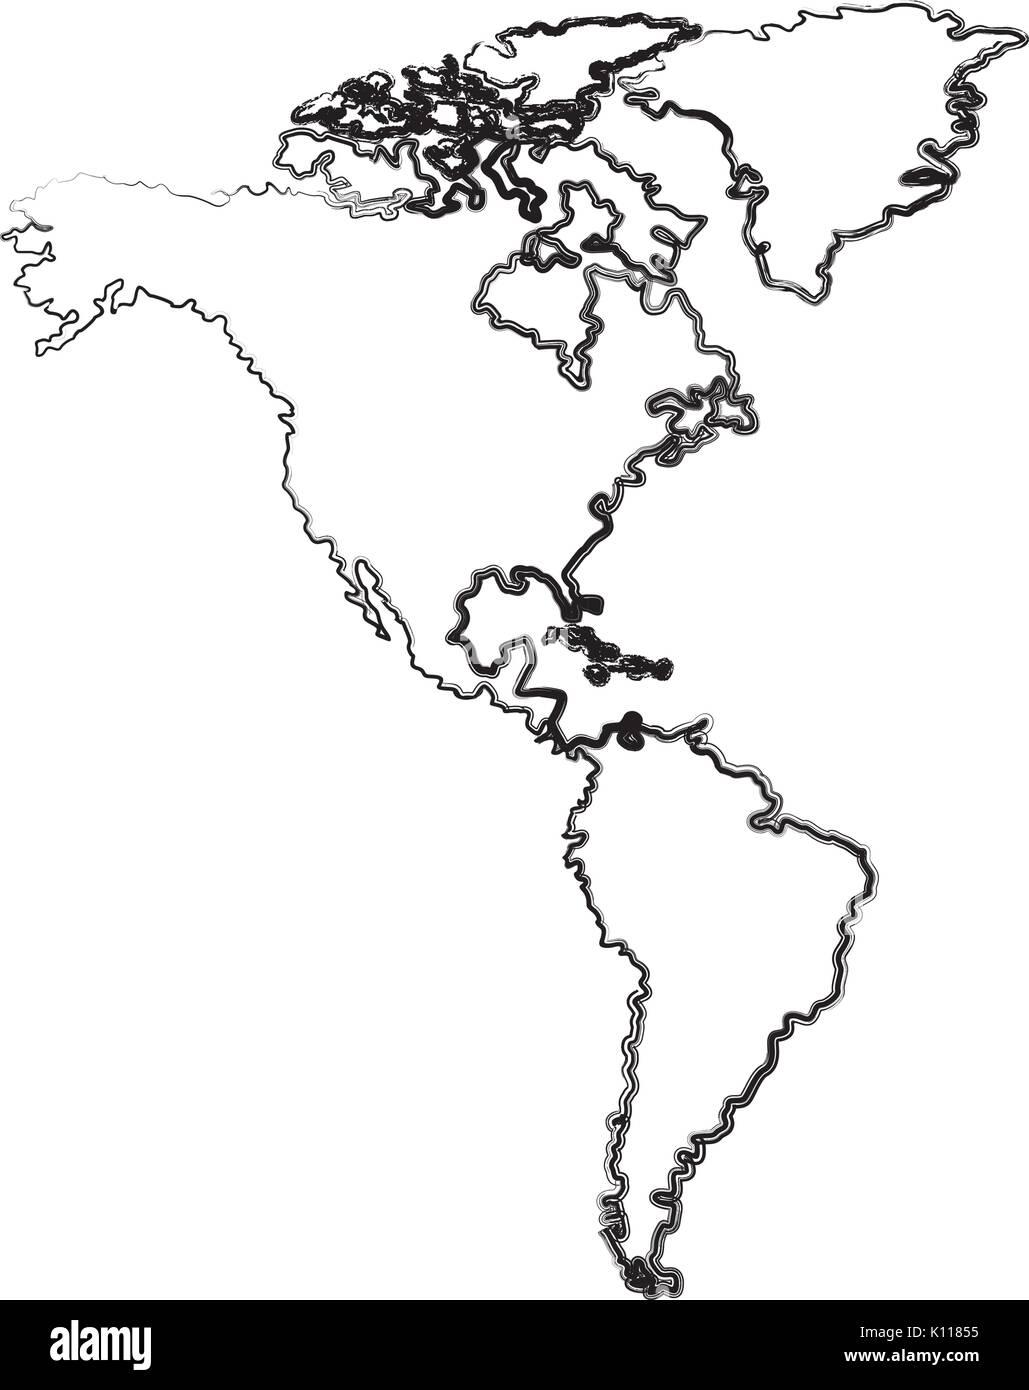 Amerika Karte Schwarz Weiß.America Map Stockfotos America Map Bilder Seite 2 Alamy